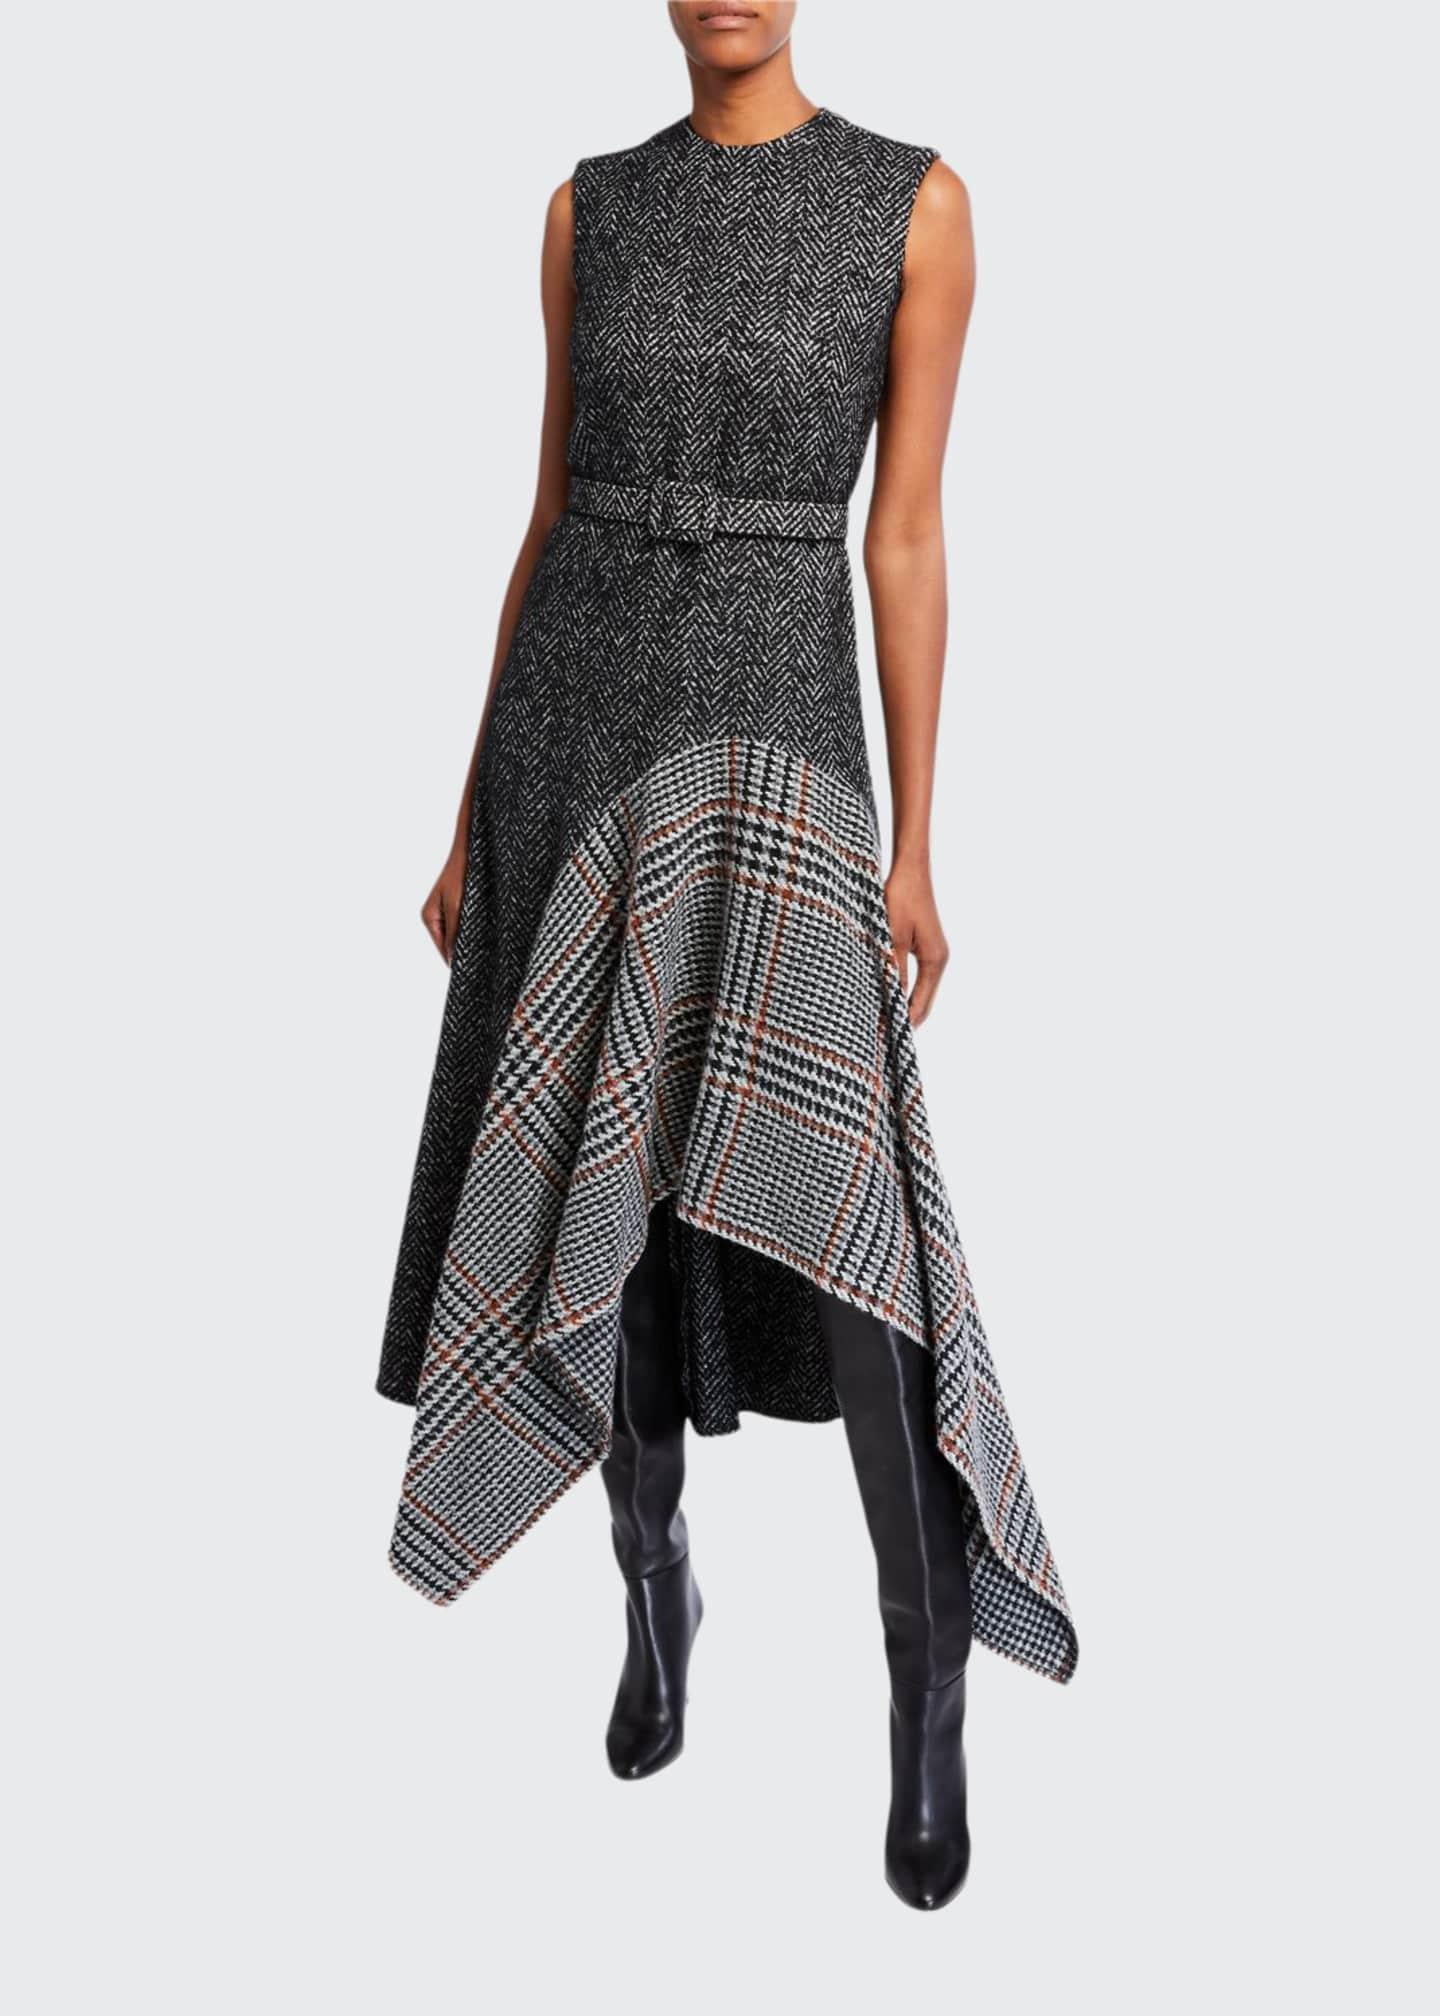 Oscar de la Renta Multiprint Wool-Silk Day Dress